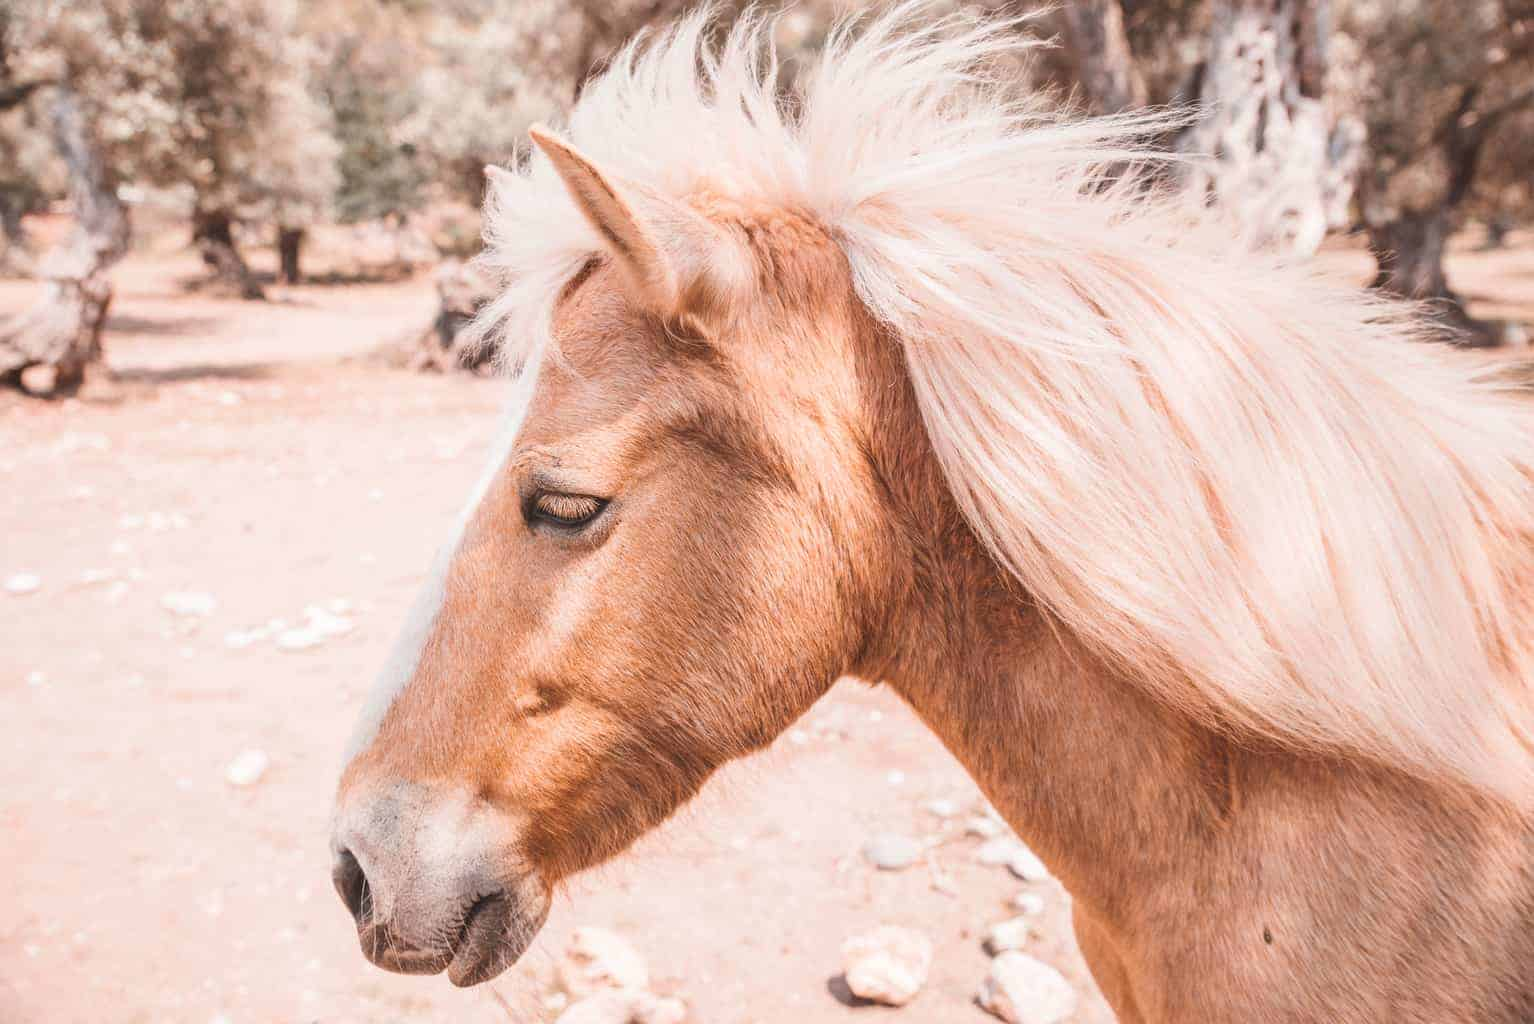 Horse at Cala Tuent beach in Mallorca.